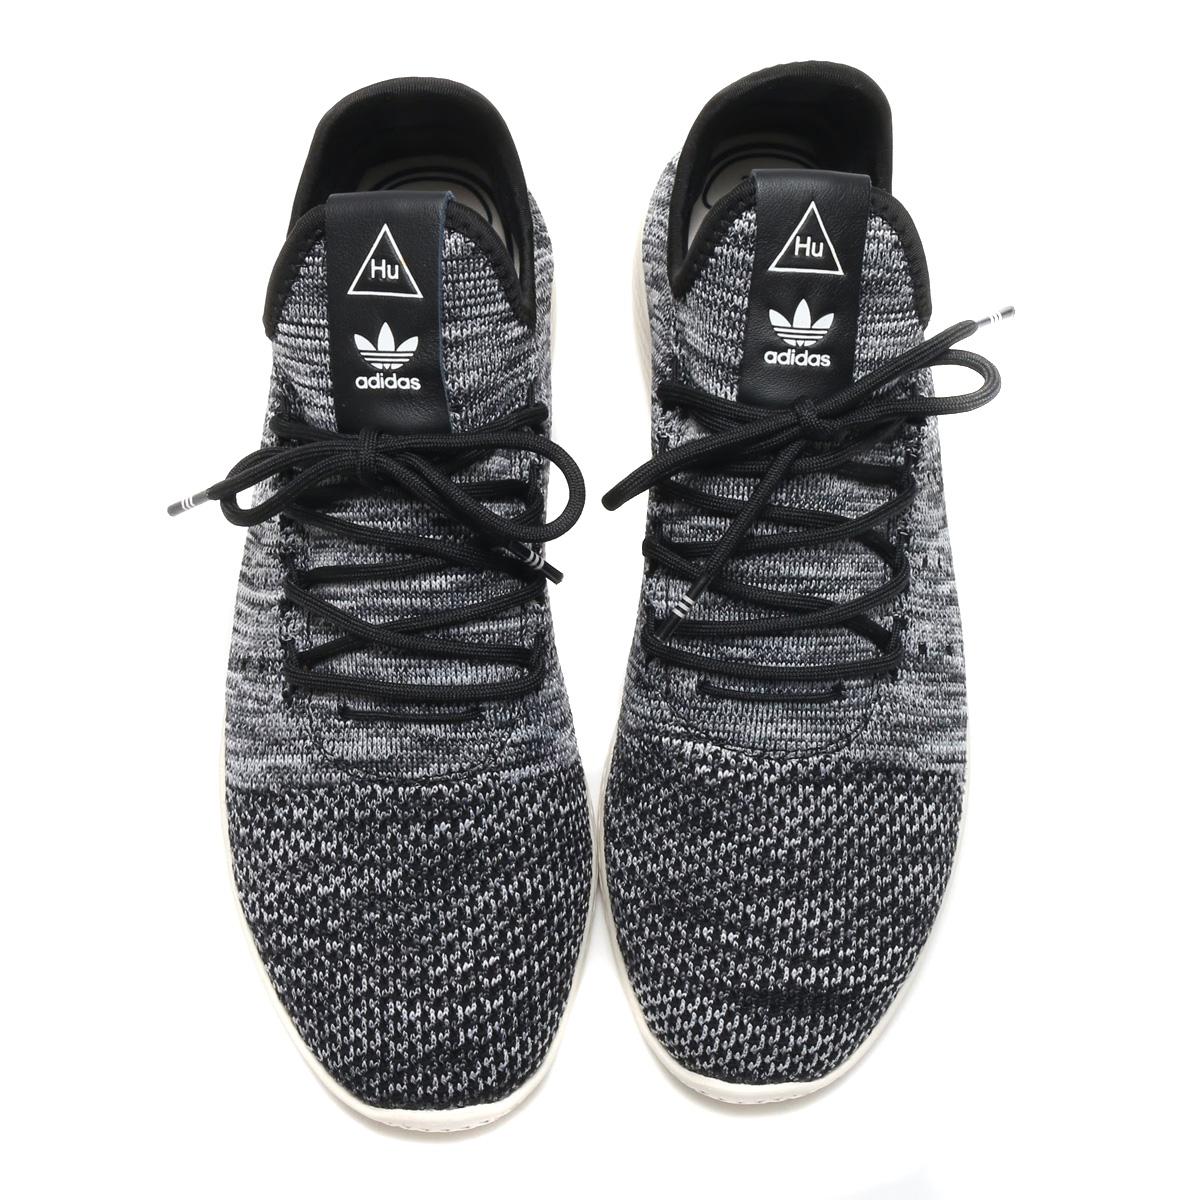 adidas Originals PW TENNIS HU PK (Adidas originals Farrell Williams tennis  HU PK) Chalk White   Core Black   Running White 18SP-S 6f19e218a897b